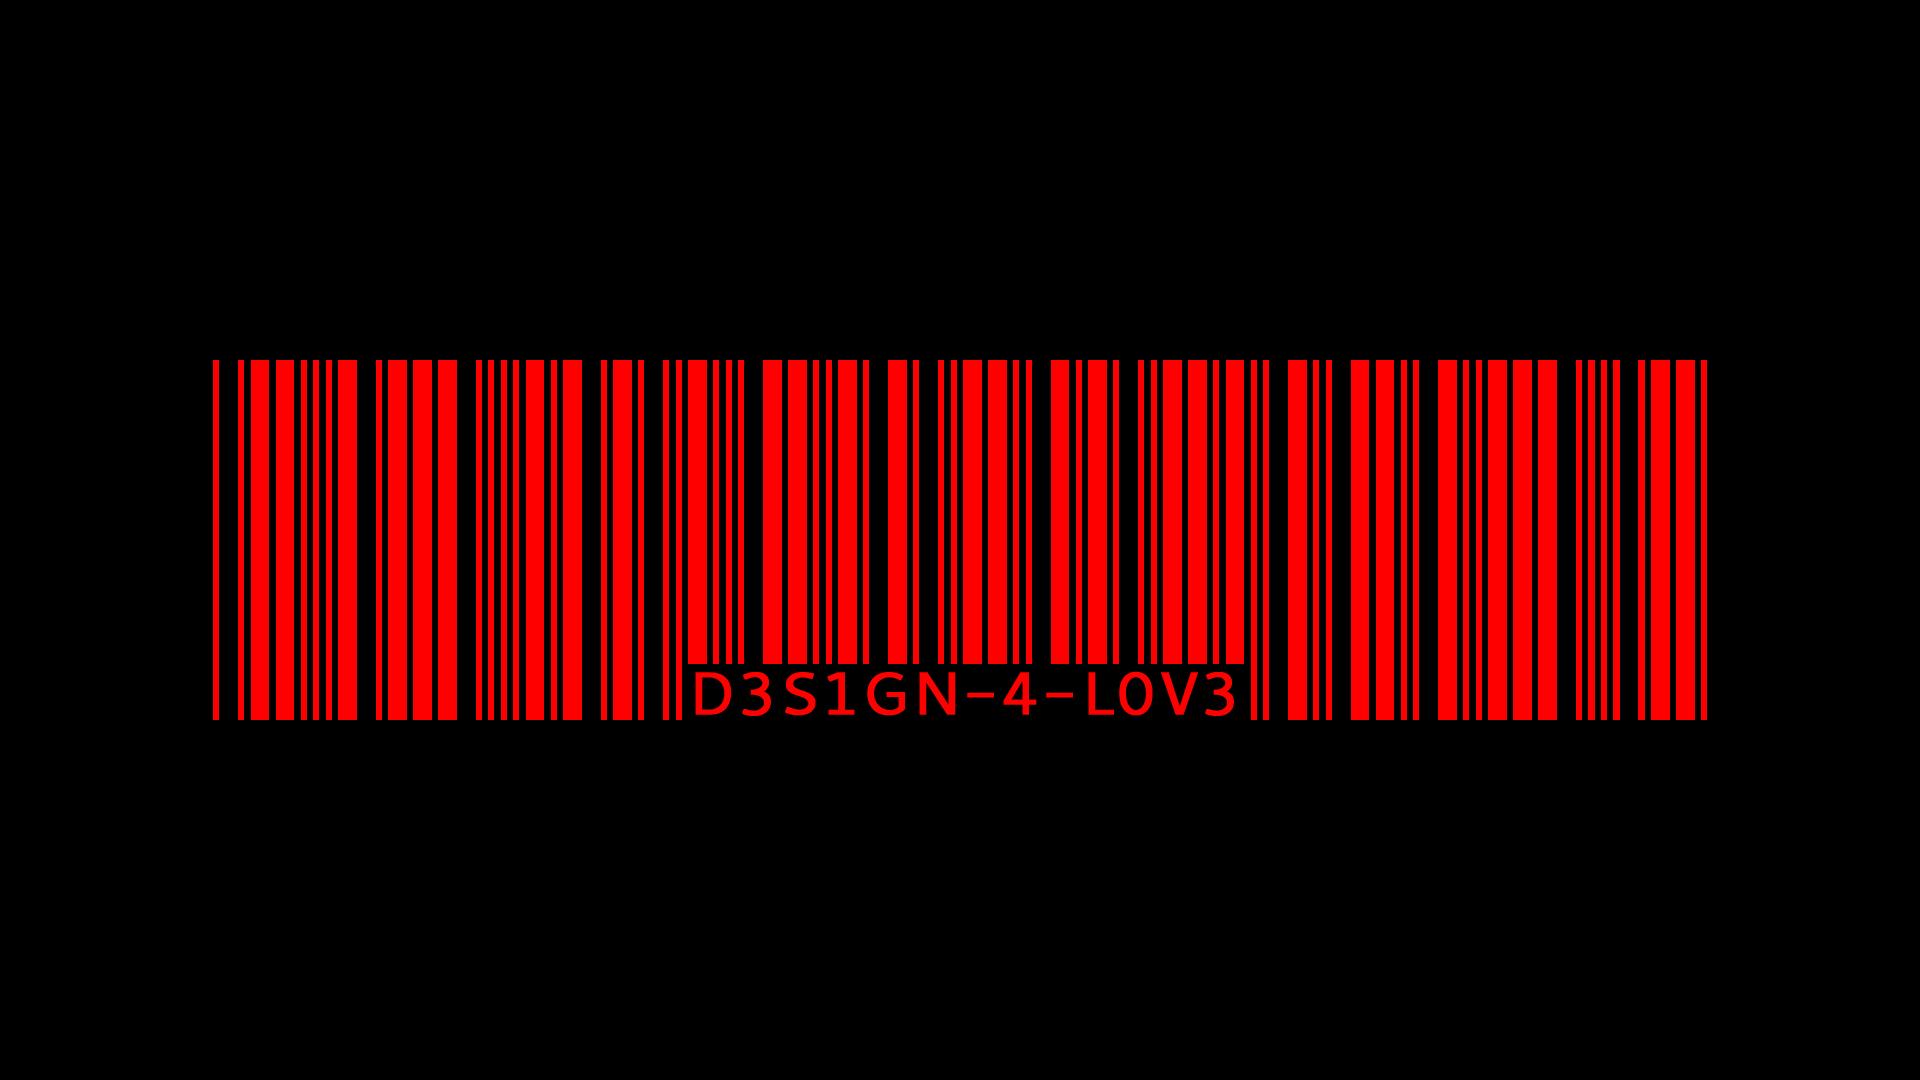 design 4 love - black-redjwstarbuck09 on deviantart